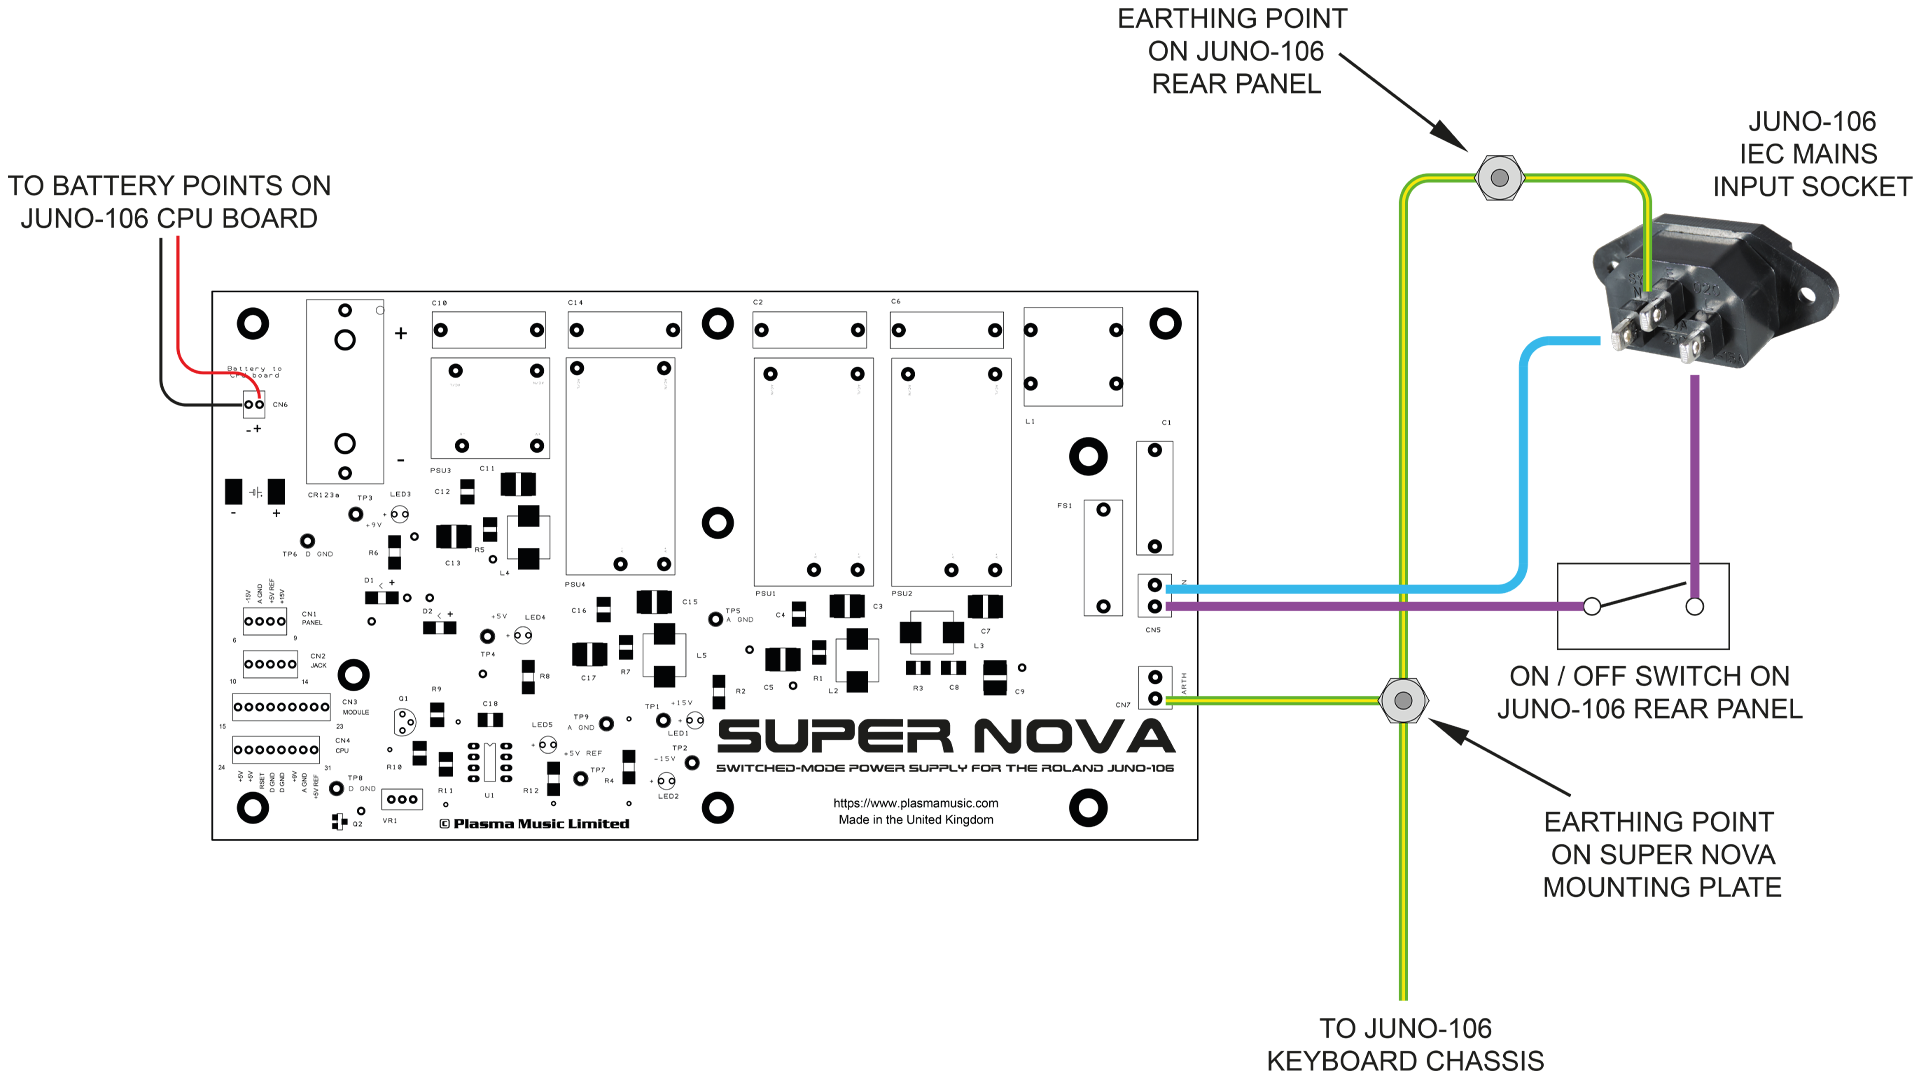 Super Nova wiring